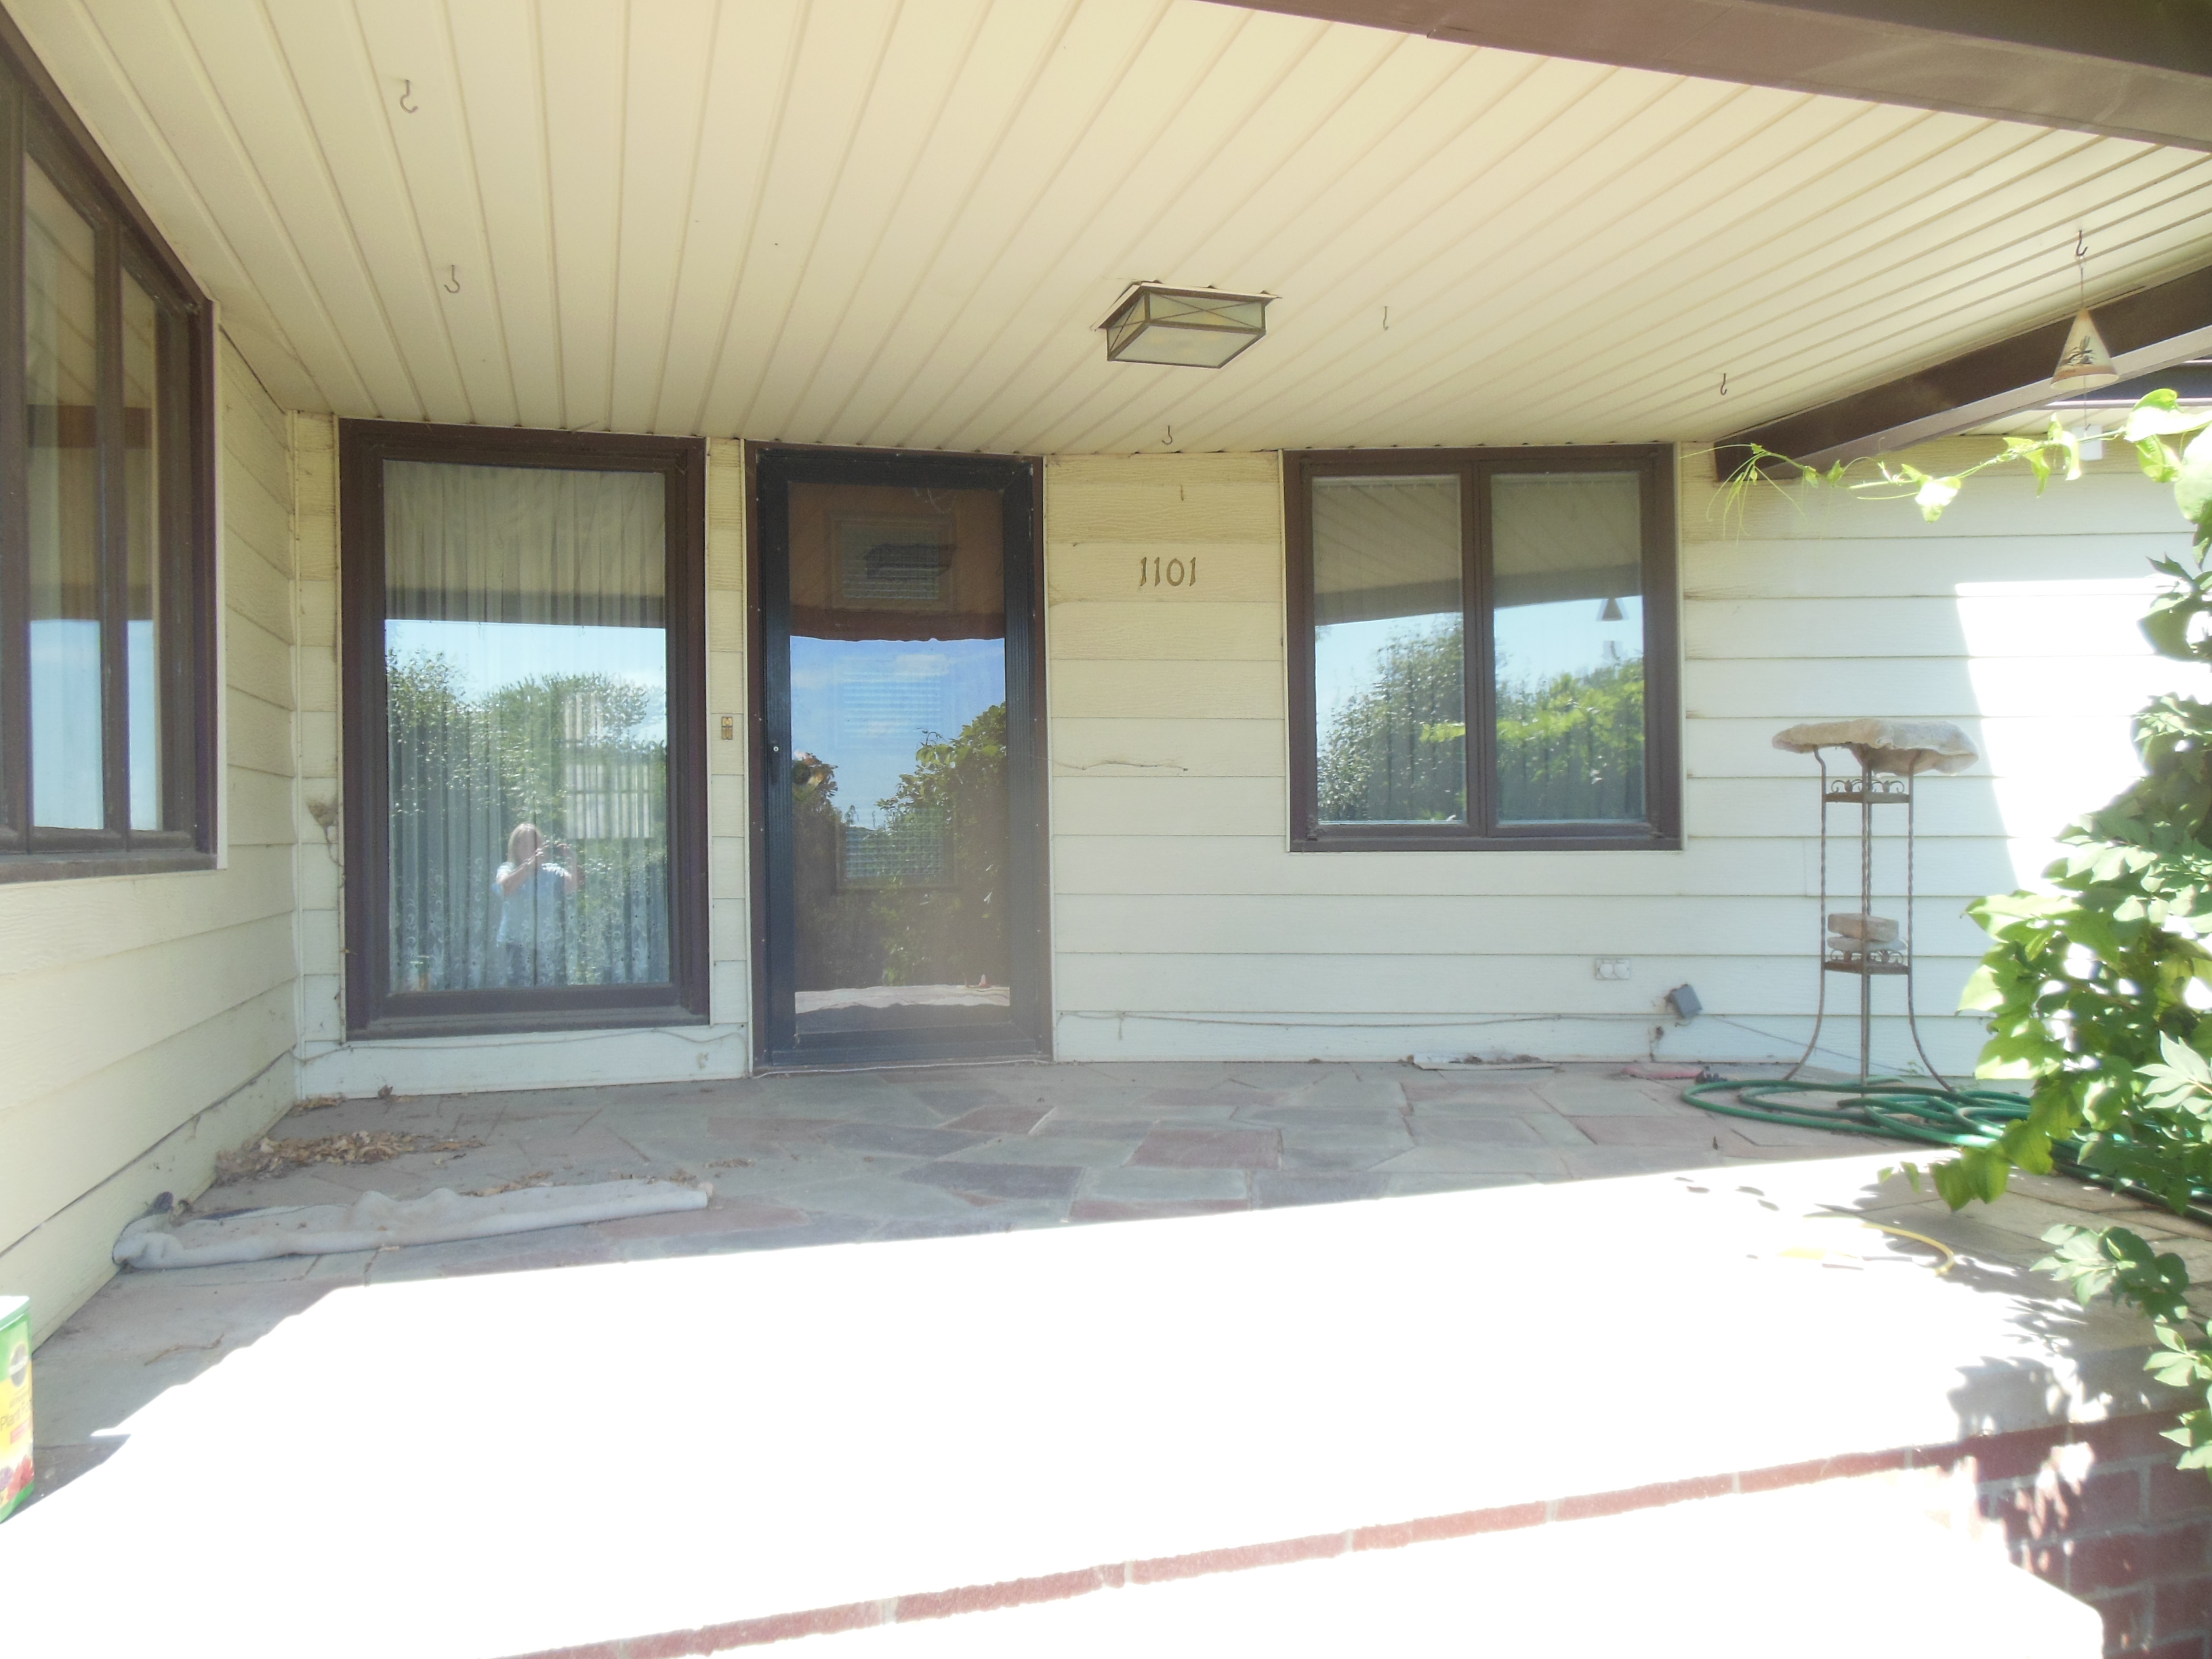 1101 Lincolnway, Woodbine